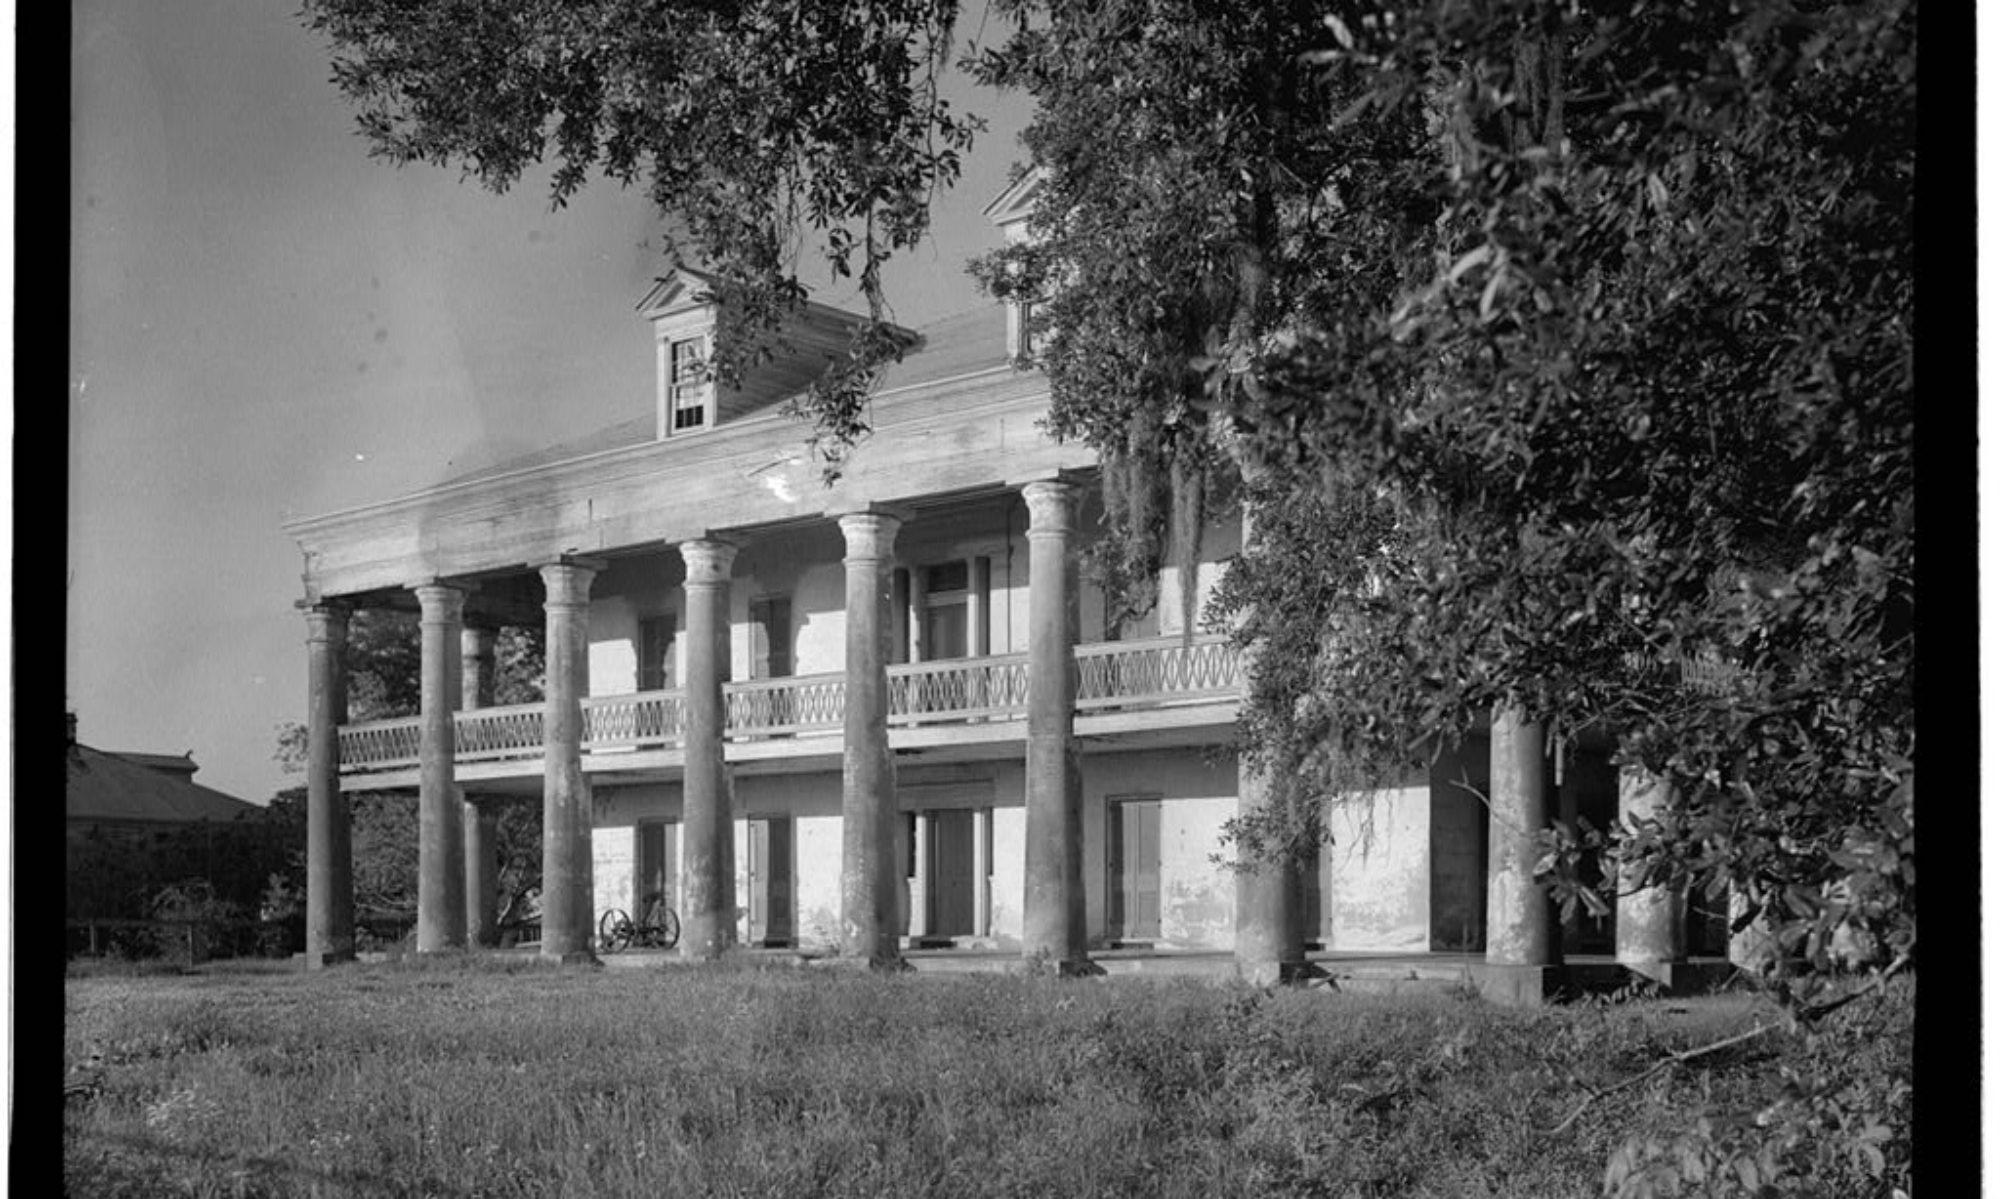 The Uncle Sam Plantation Project